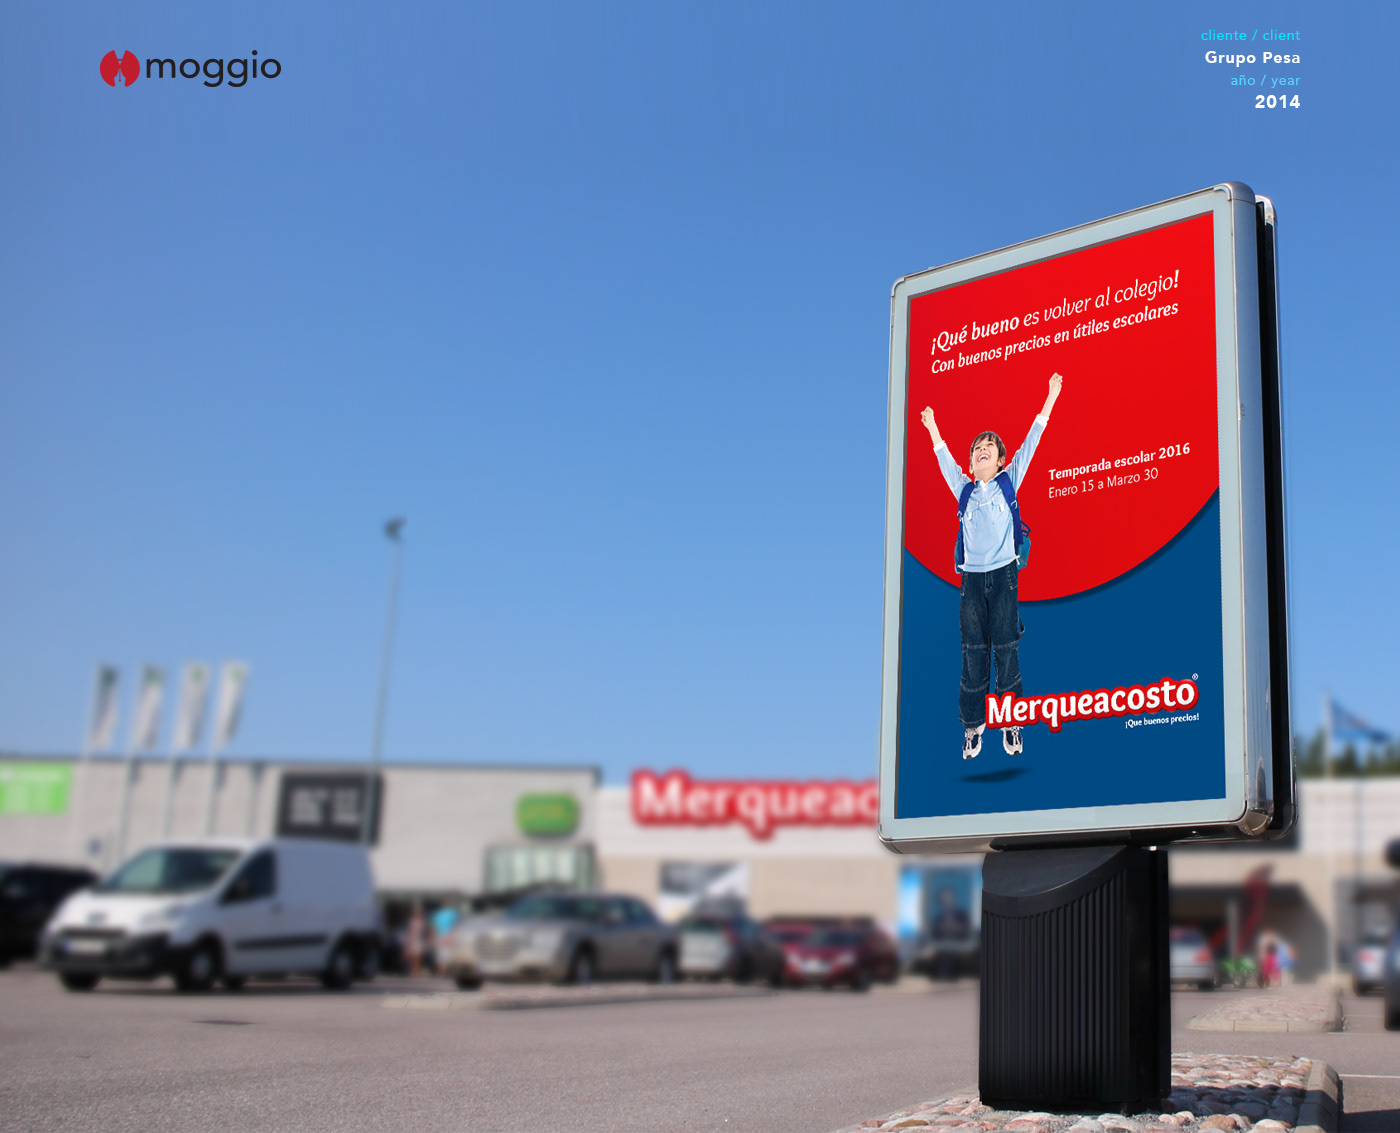 branding  logo brand Supermarket graphic design  colombia rebranding market Signage bogota